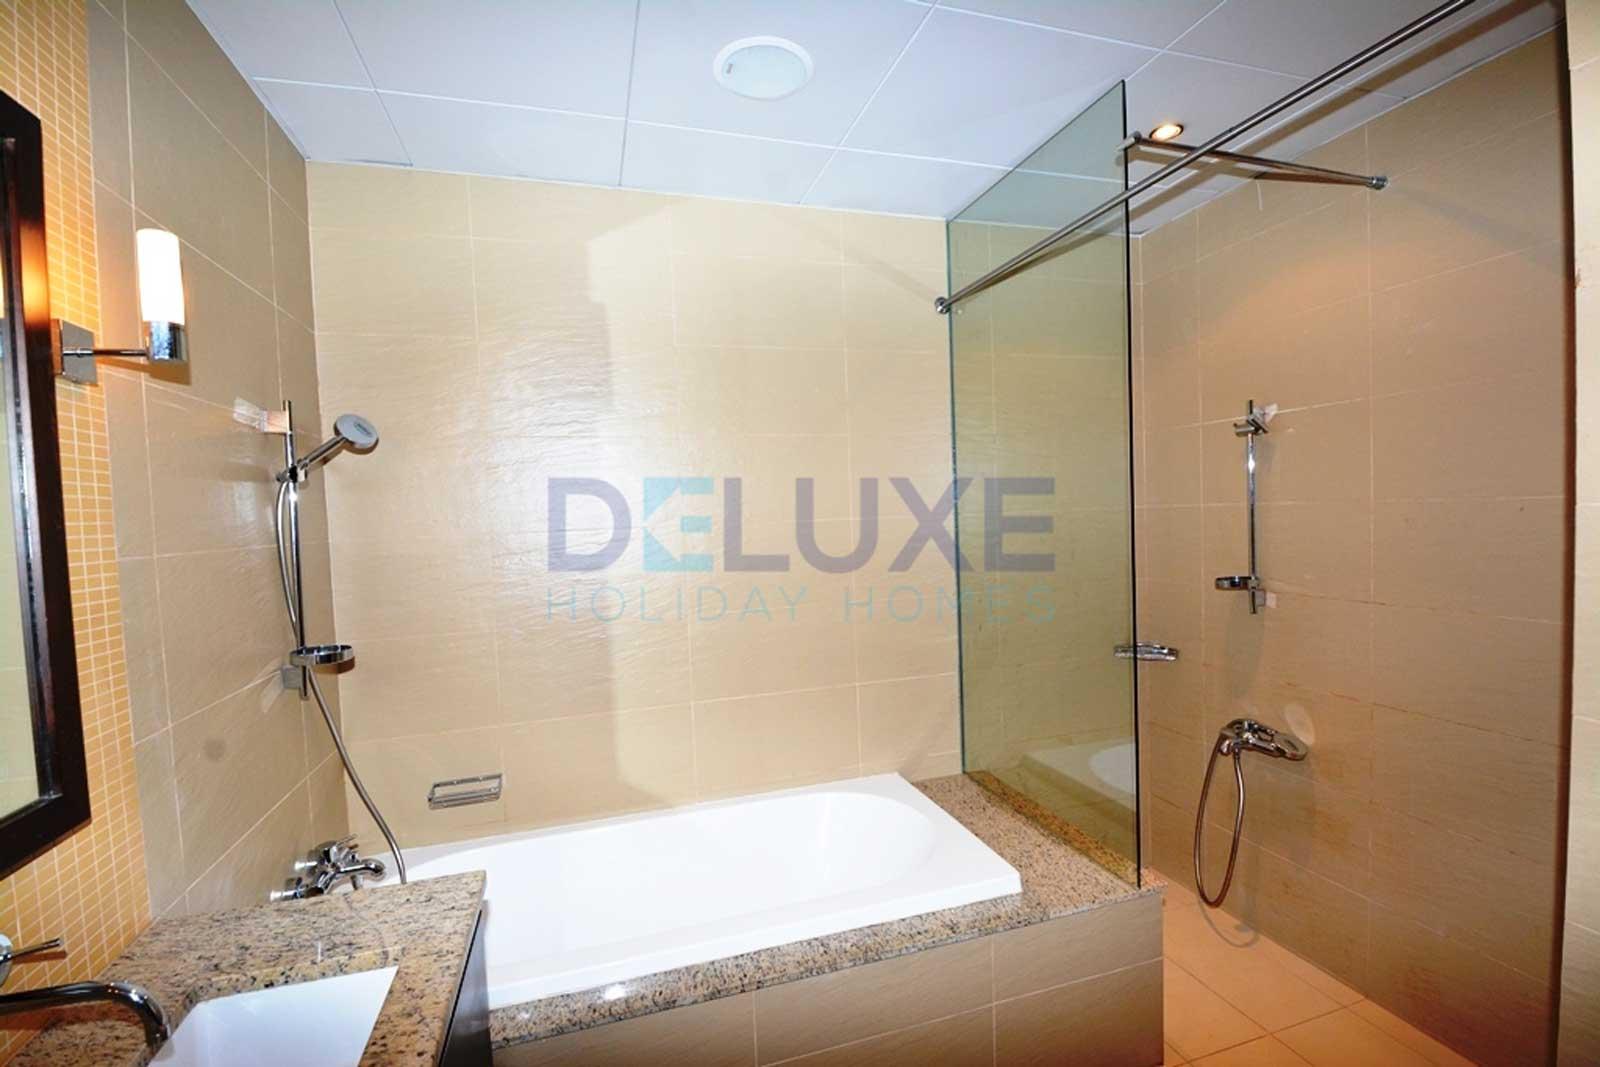 Al Bateen - Bathroom - Deluxe Holiday Homes